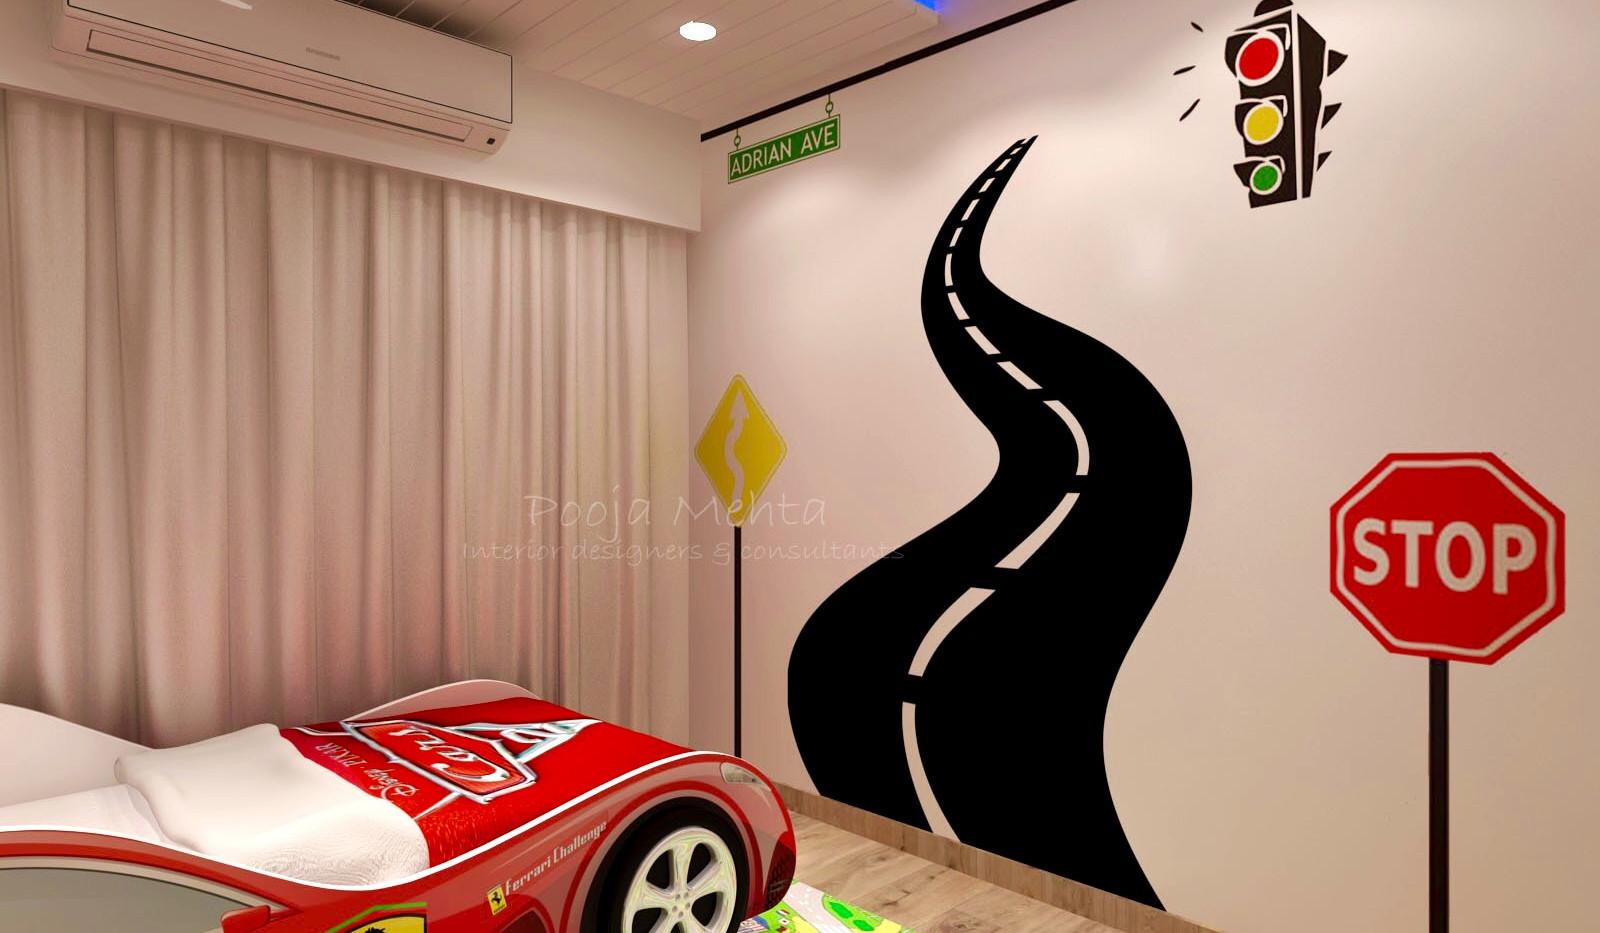 Experienced Residential Interior Designers In Mumbai - Pooja Mehta Designing Dreams